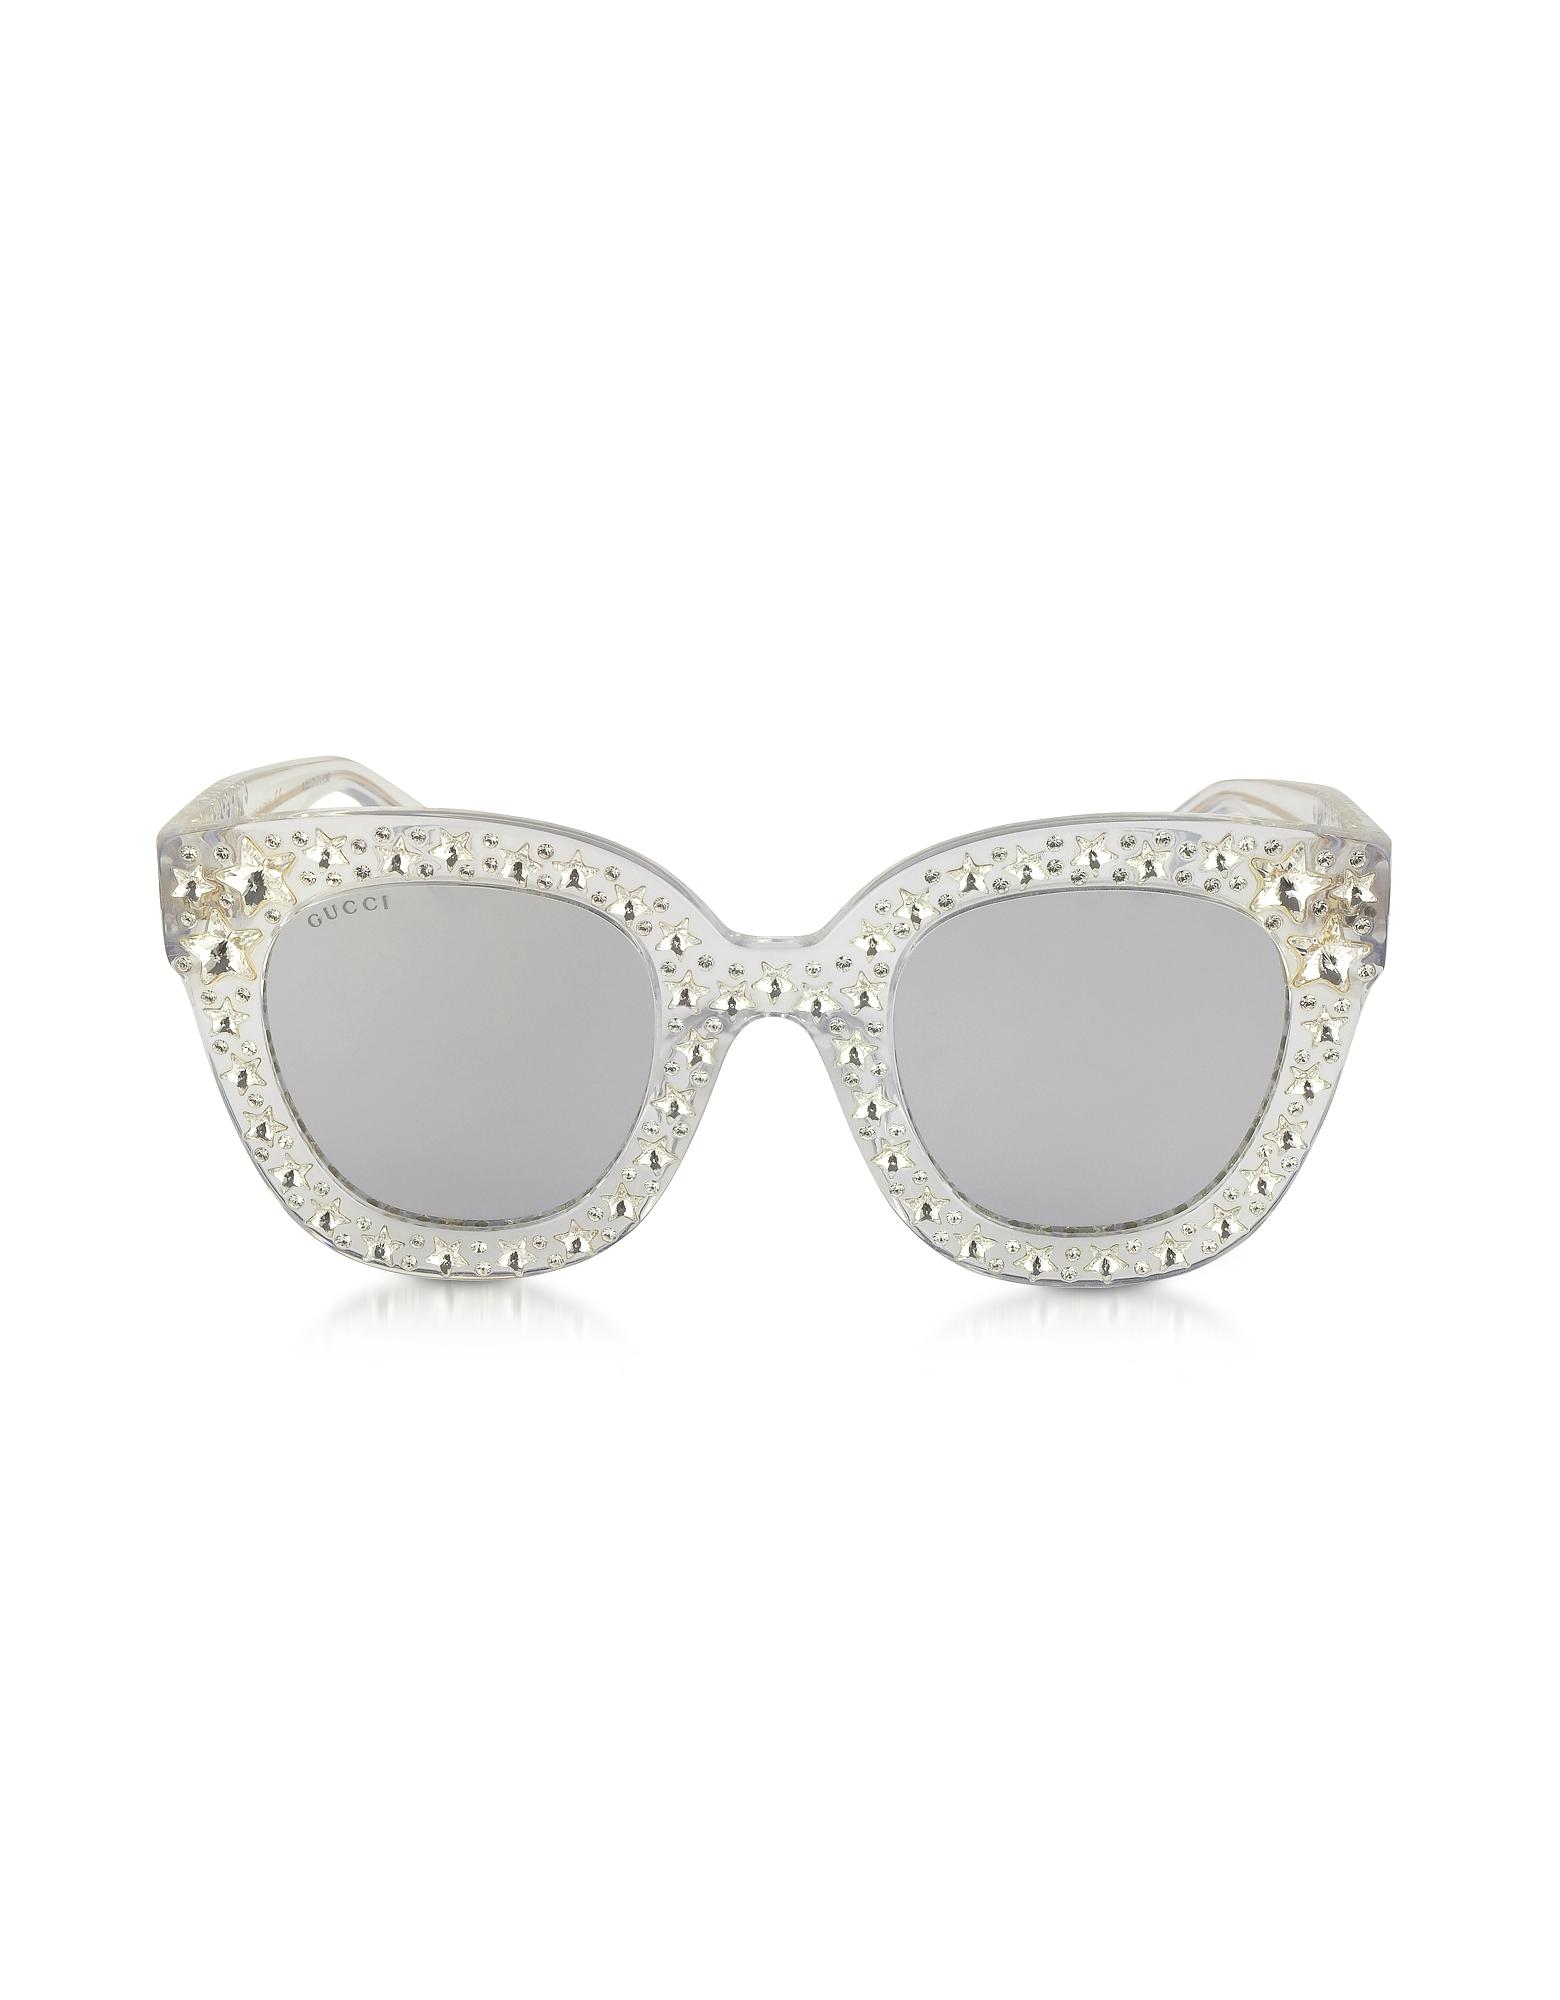 Gucci Sunglasses, GG0116S Acetate Cat Eye Women's Sunglasses w/Stars feature star worthy retro